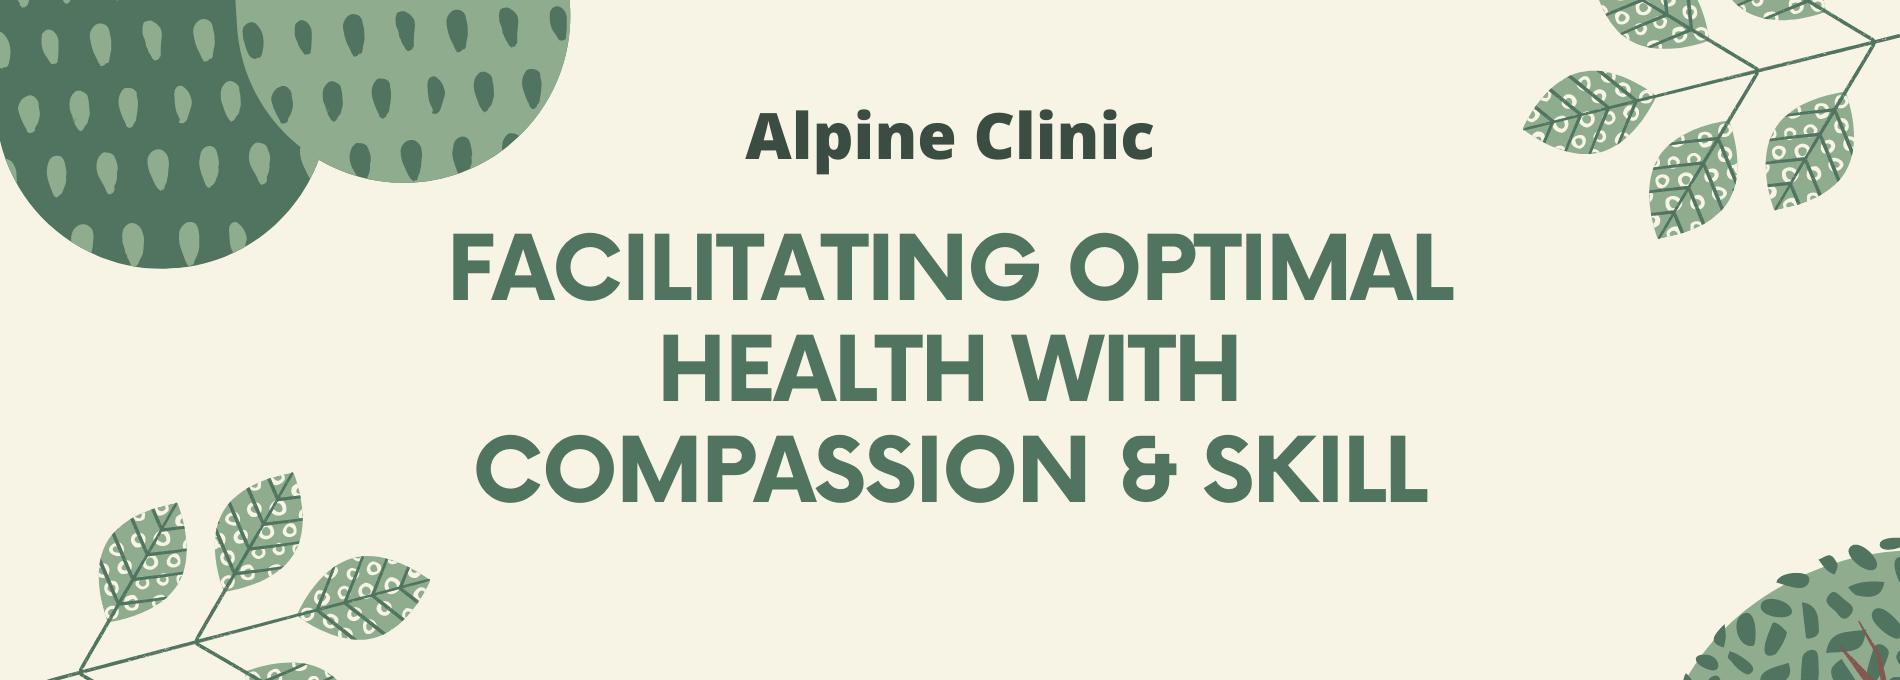 Facilitating Optimal Health